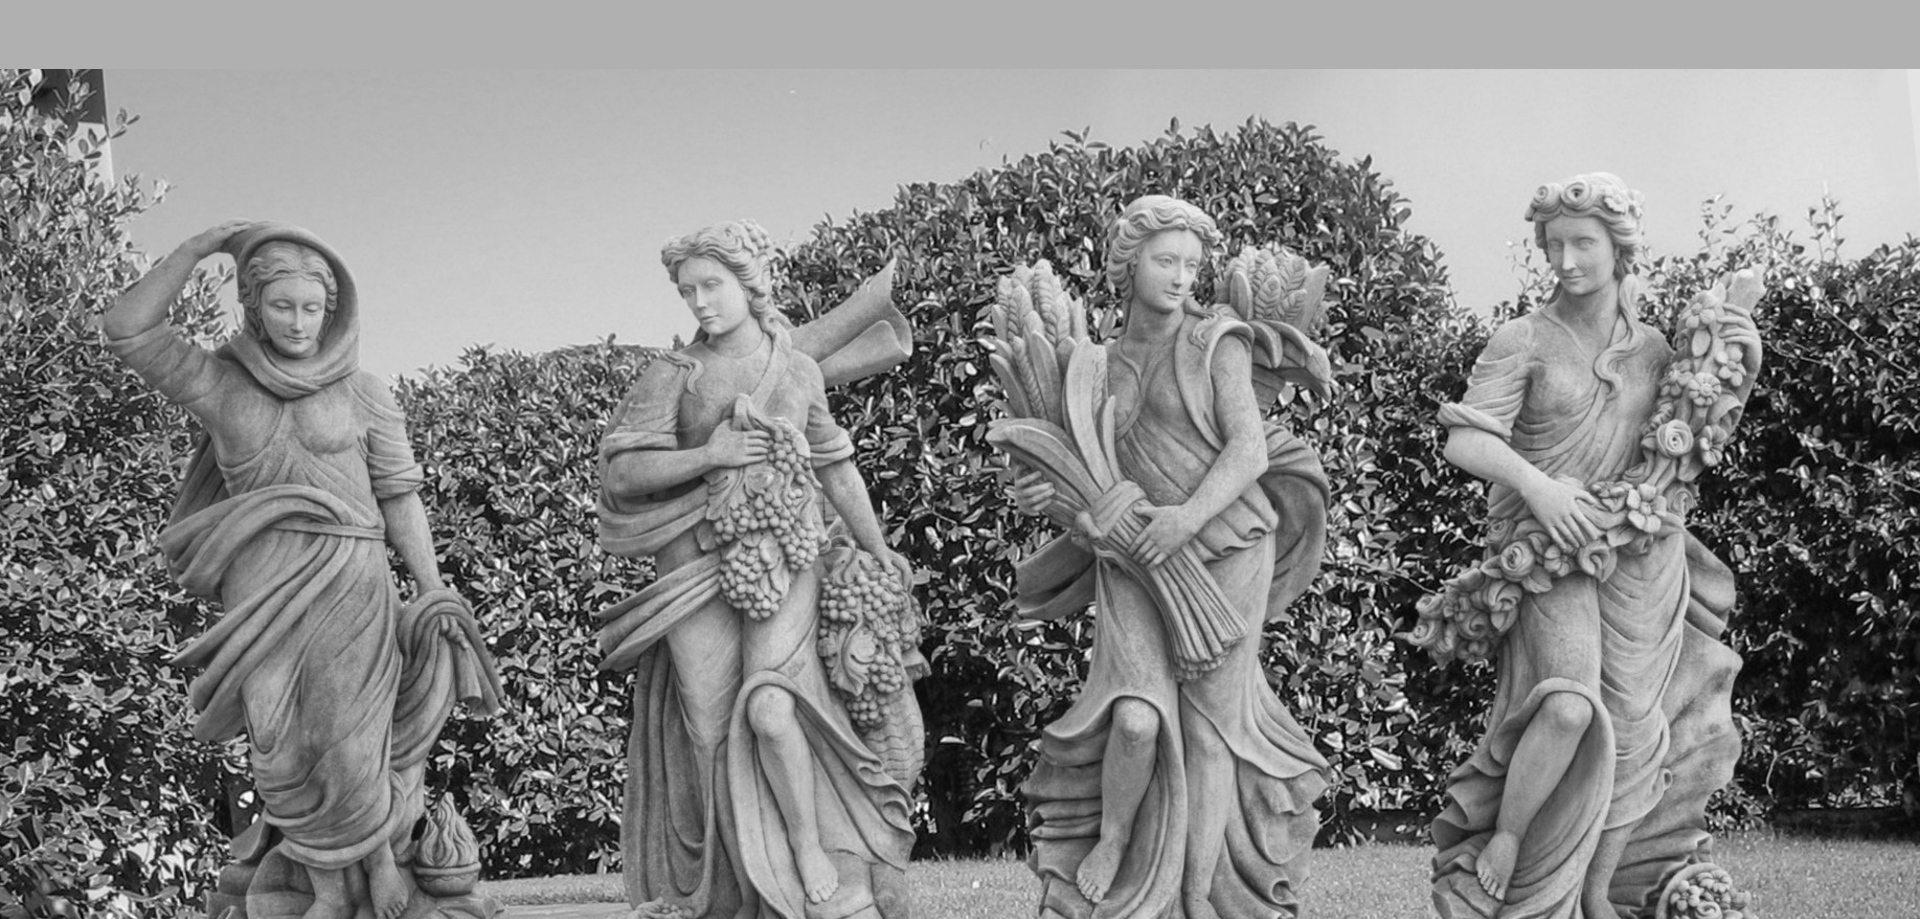 Montagna Legnami Alte Ceccato peotta bruno - italian sculptures, vicenza stone sculptures